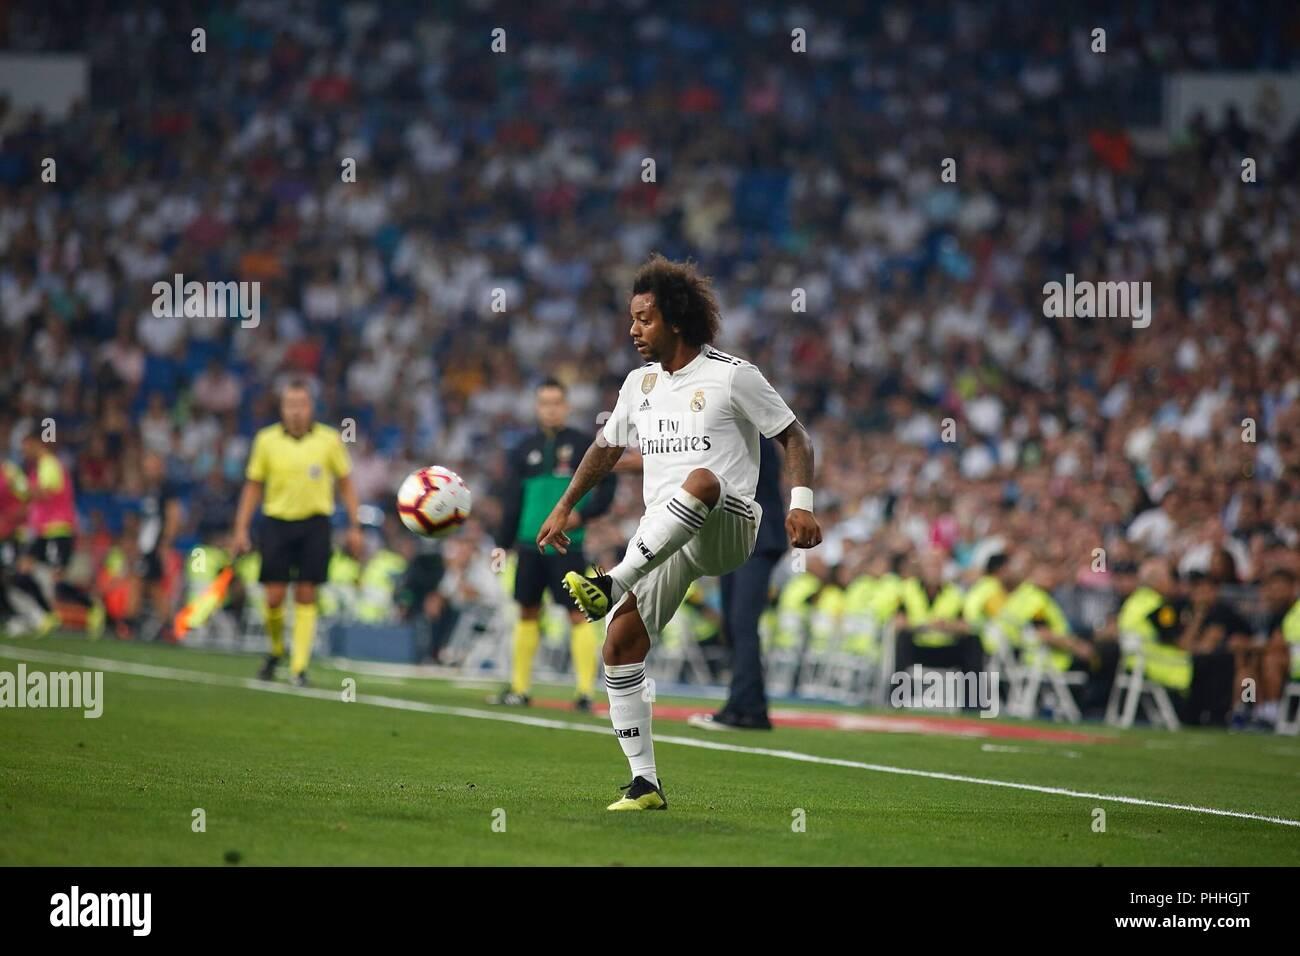 Madrid, Spain. 1th September 2018: Marcelo, defender from Real  Madrid CF, during  LaLiga Santander round 3 against CD Leganes at  Santiago Bernabeu. (Photo by: Ivan Abanades Medina / Cordon Press).   Cordon Press - Stock Image